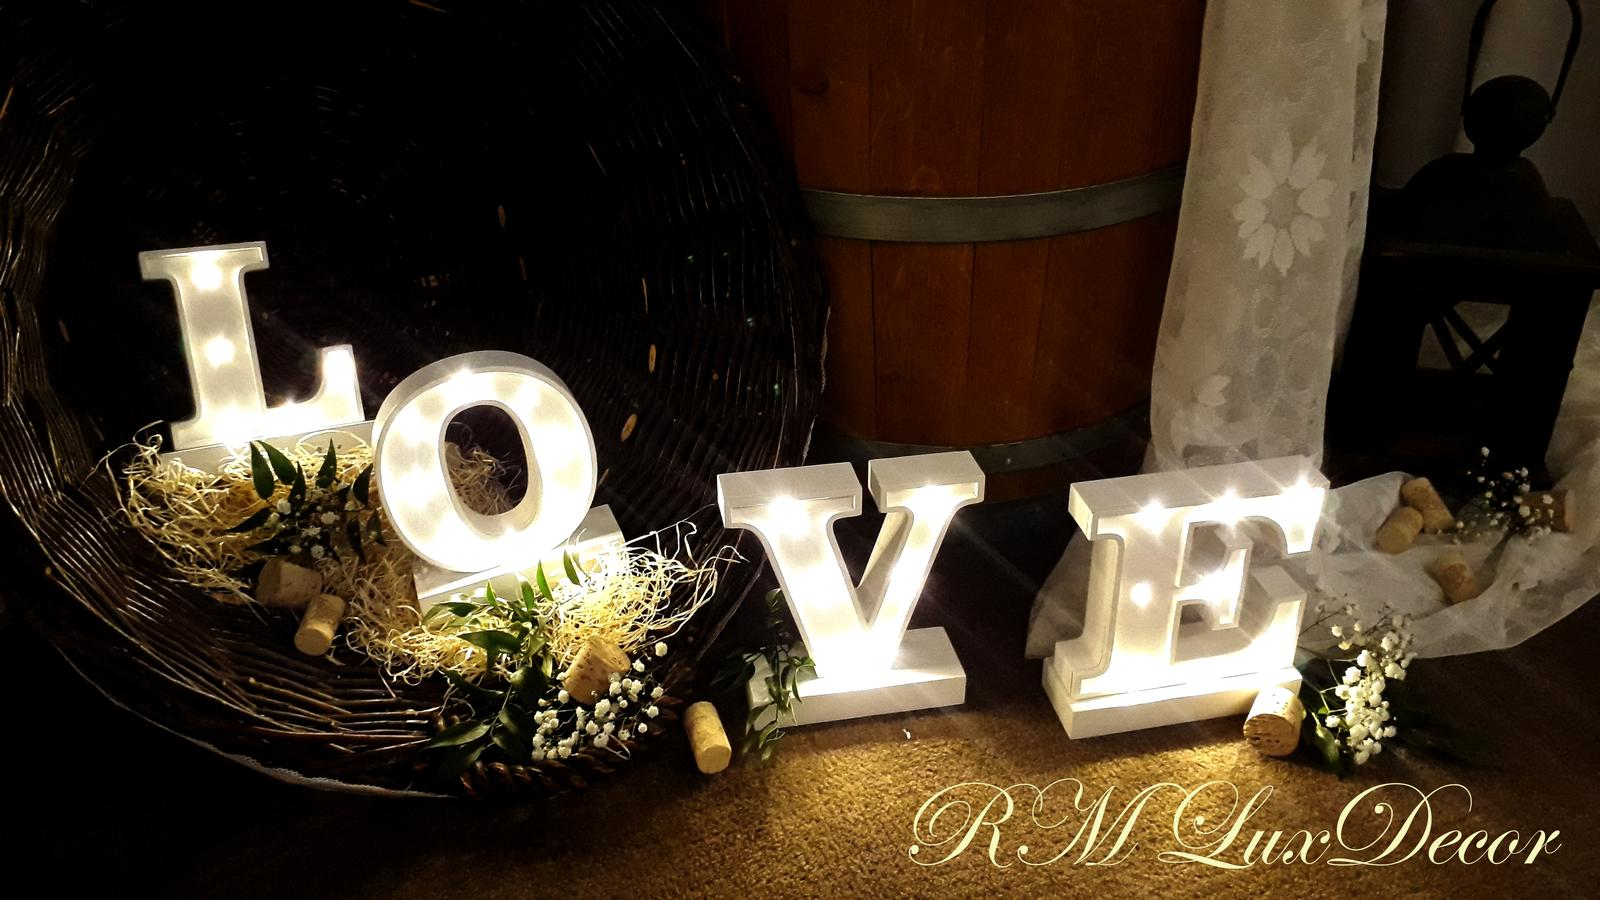 Svadba 13.10.2018 - Pezinok - Obrázok č. 6